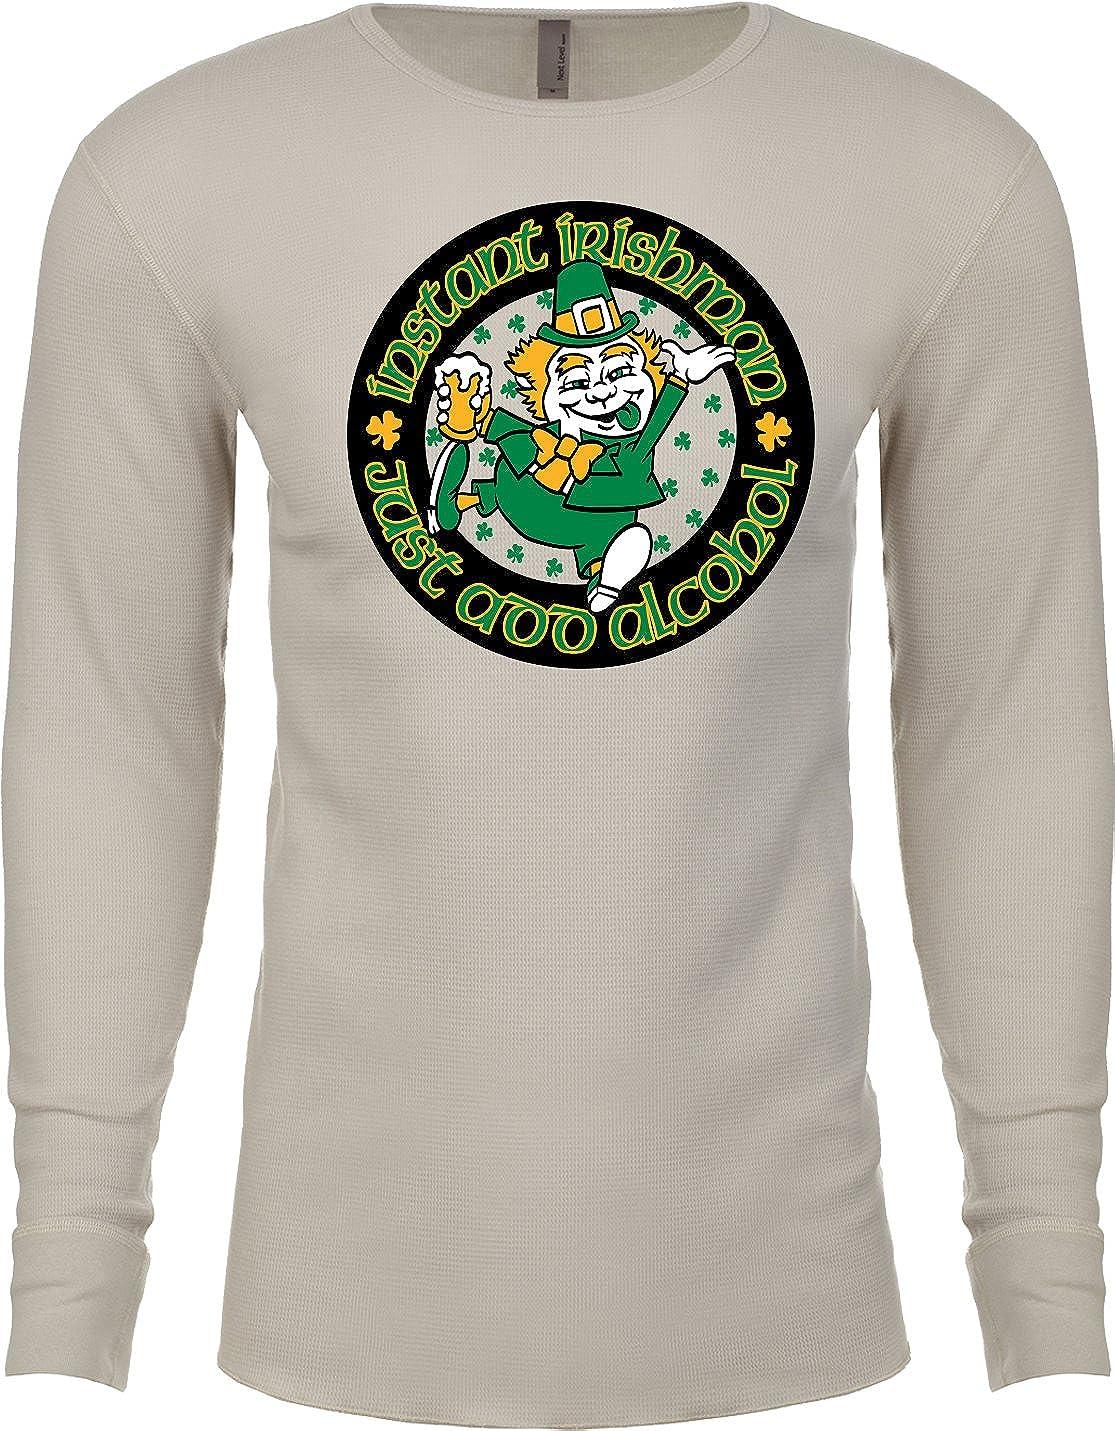 Buy Cool Shirts St Patricks Day Instant Irishman Thermal Shirt